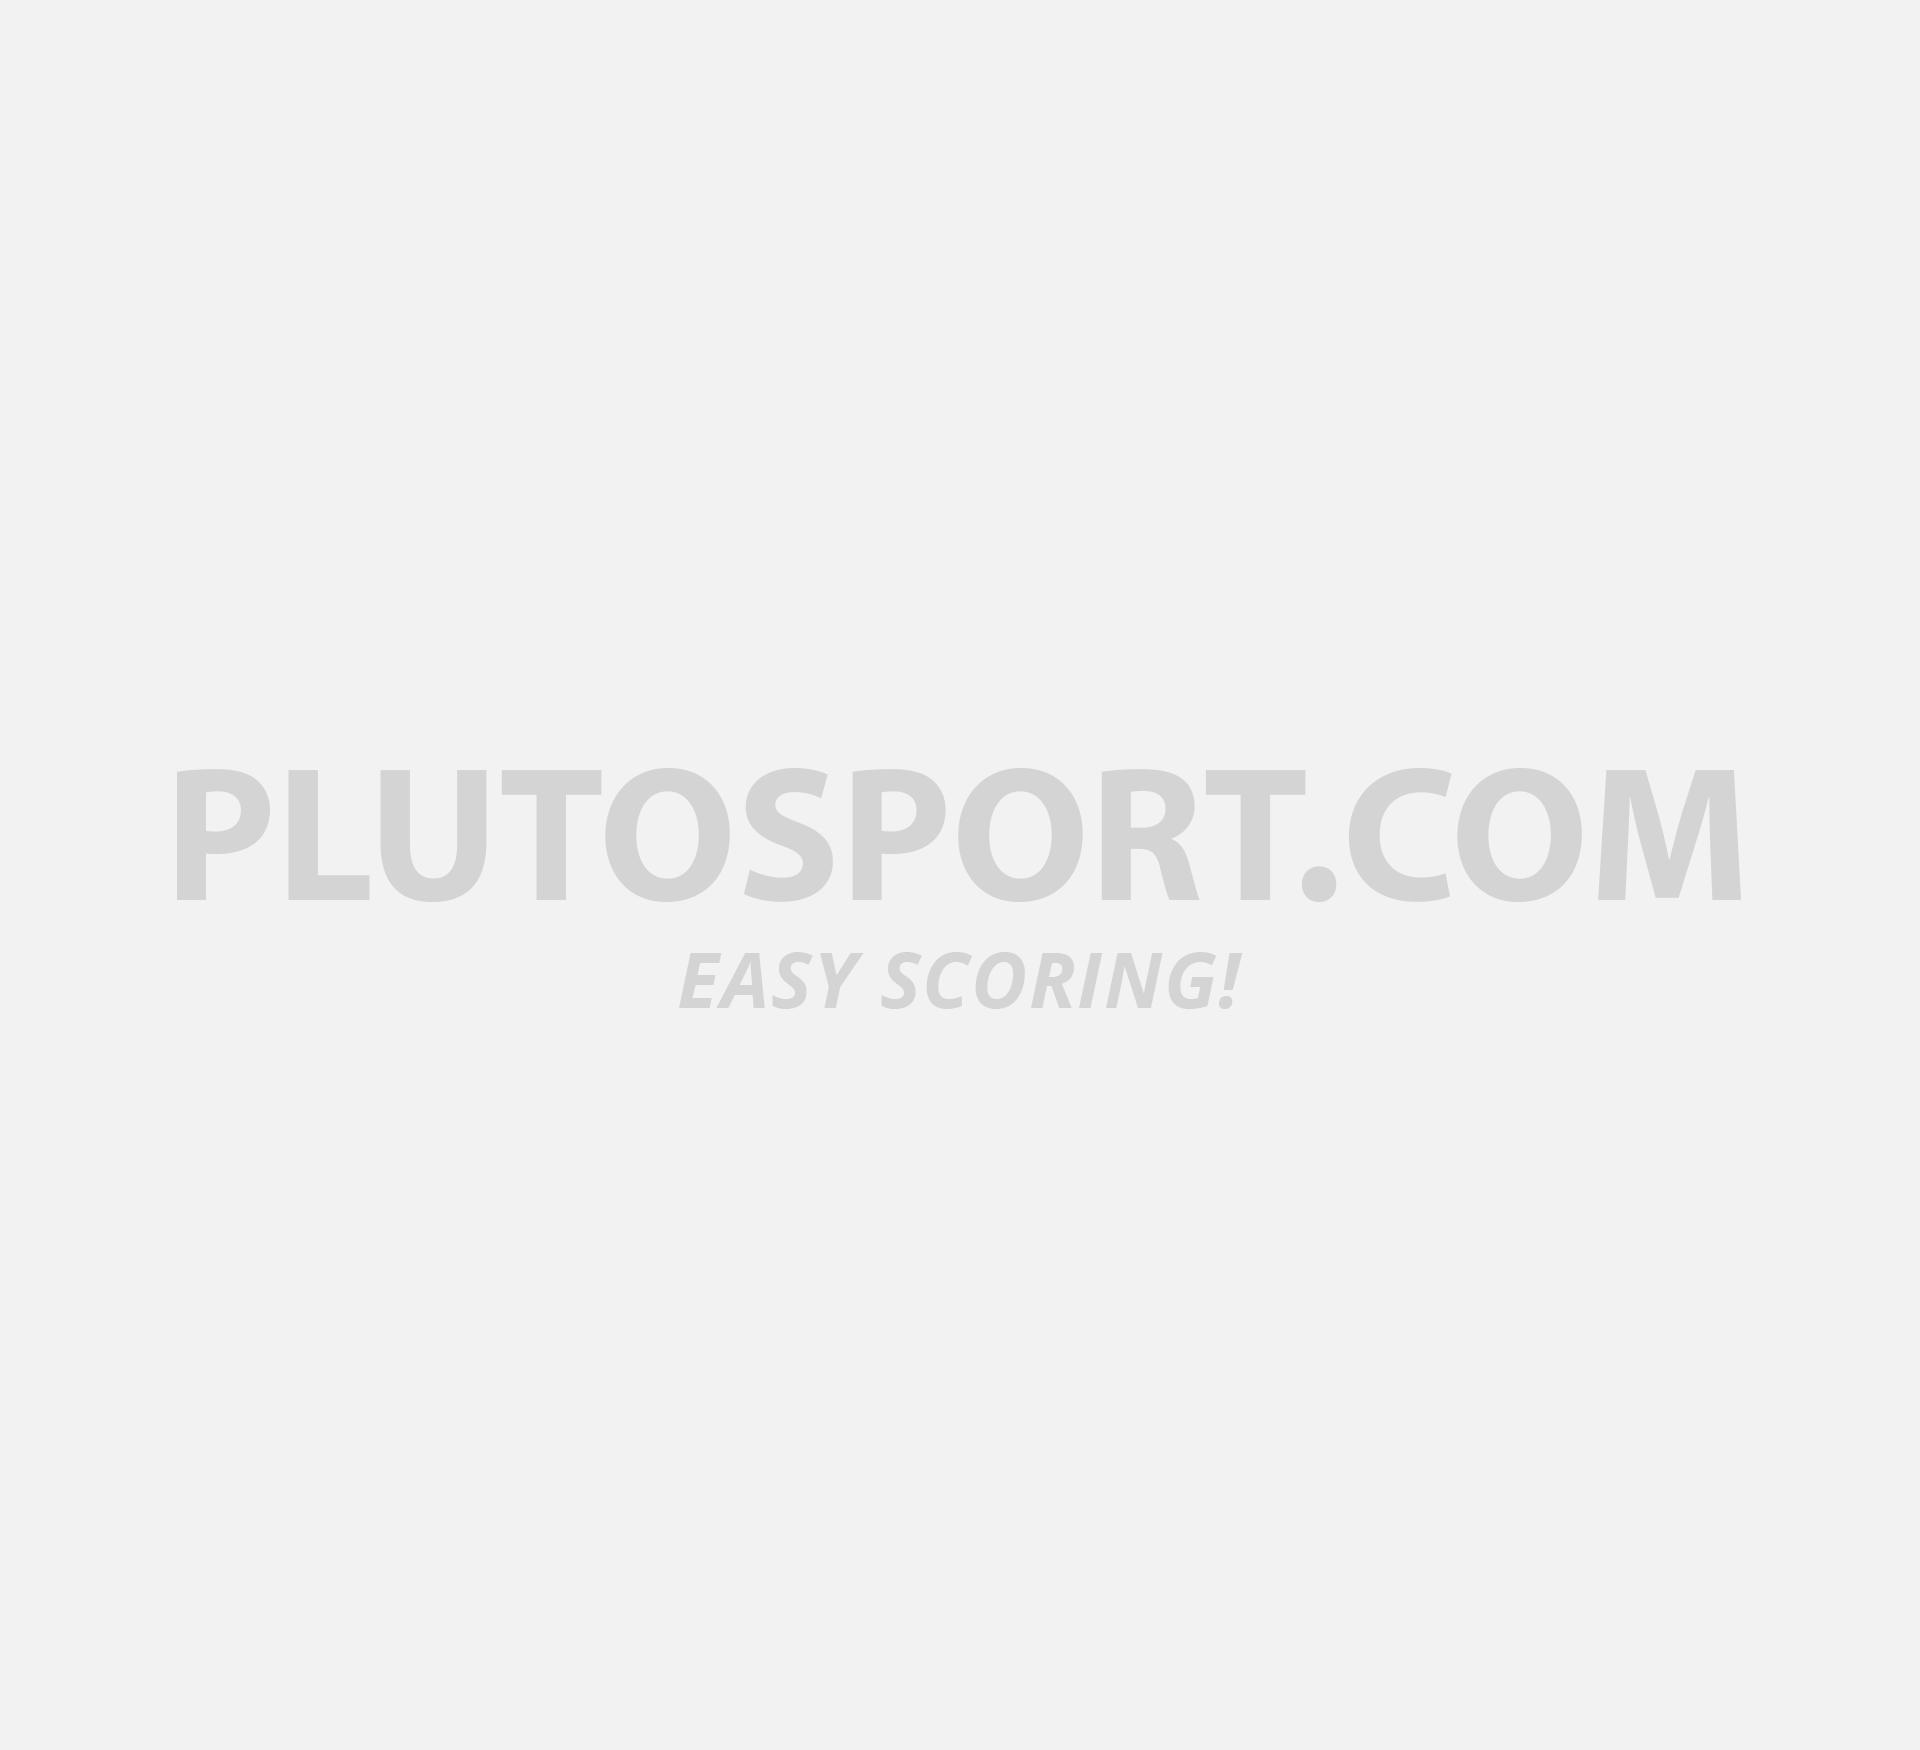 51ed53f5270 Adidas Firebird Trainingsjack - Sweatjackets - Sweaters - Clothing -  Lifestyle - Sports | Plutosport